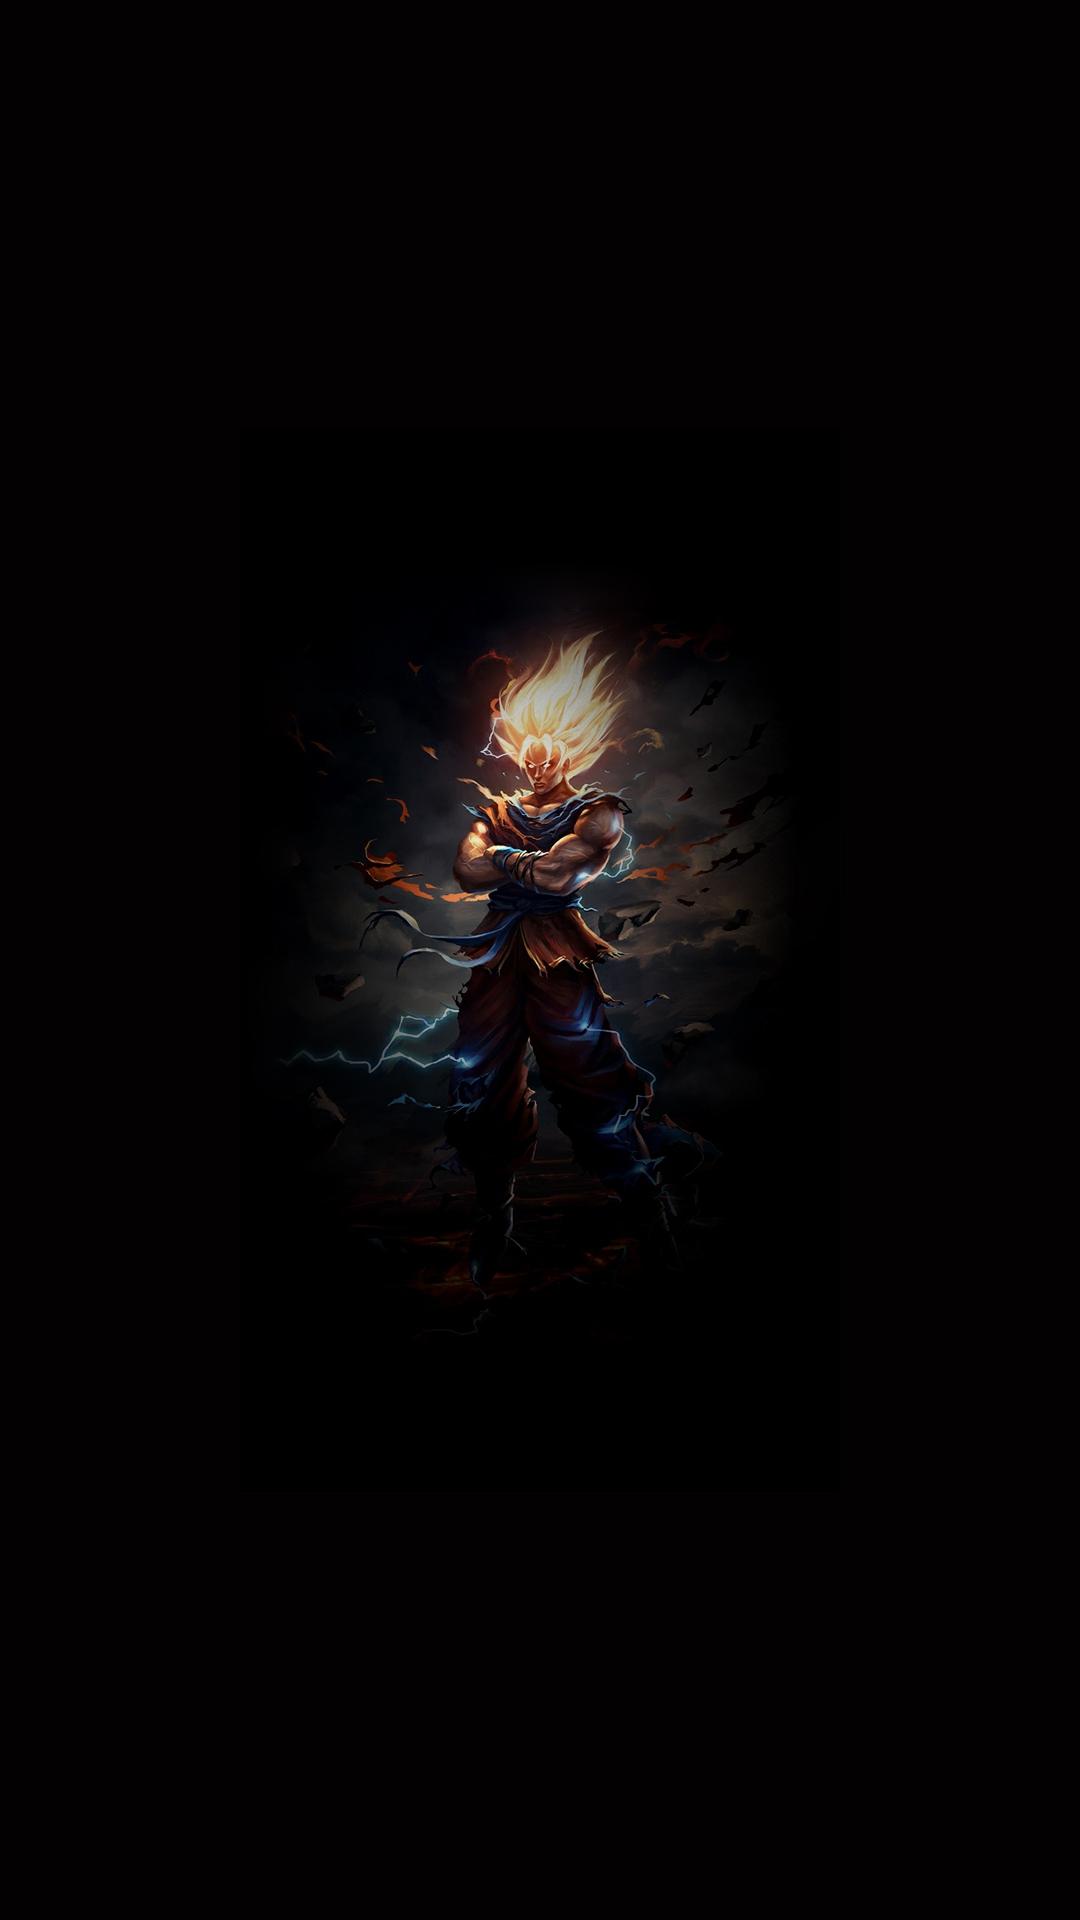 Badass Wallpapers For Android 33 0f 40 - Son Goku Dragon ...